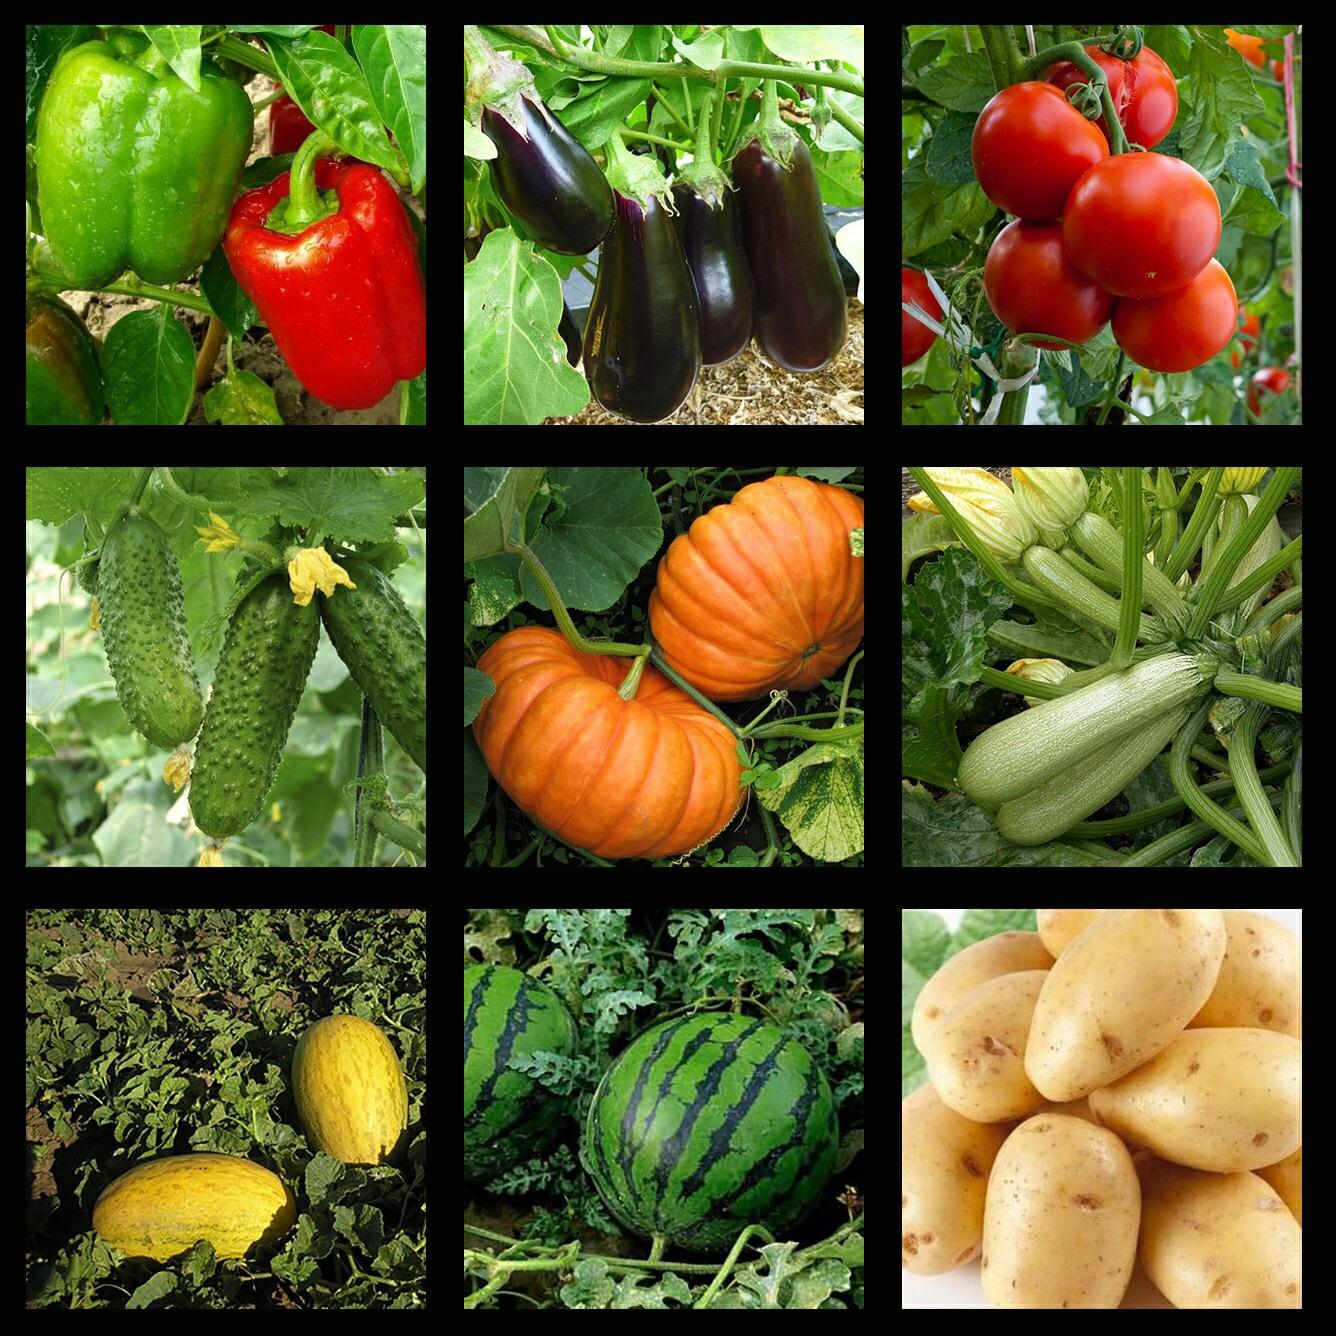 Овощи семена для посадки с картинками и описаниями